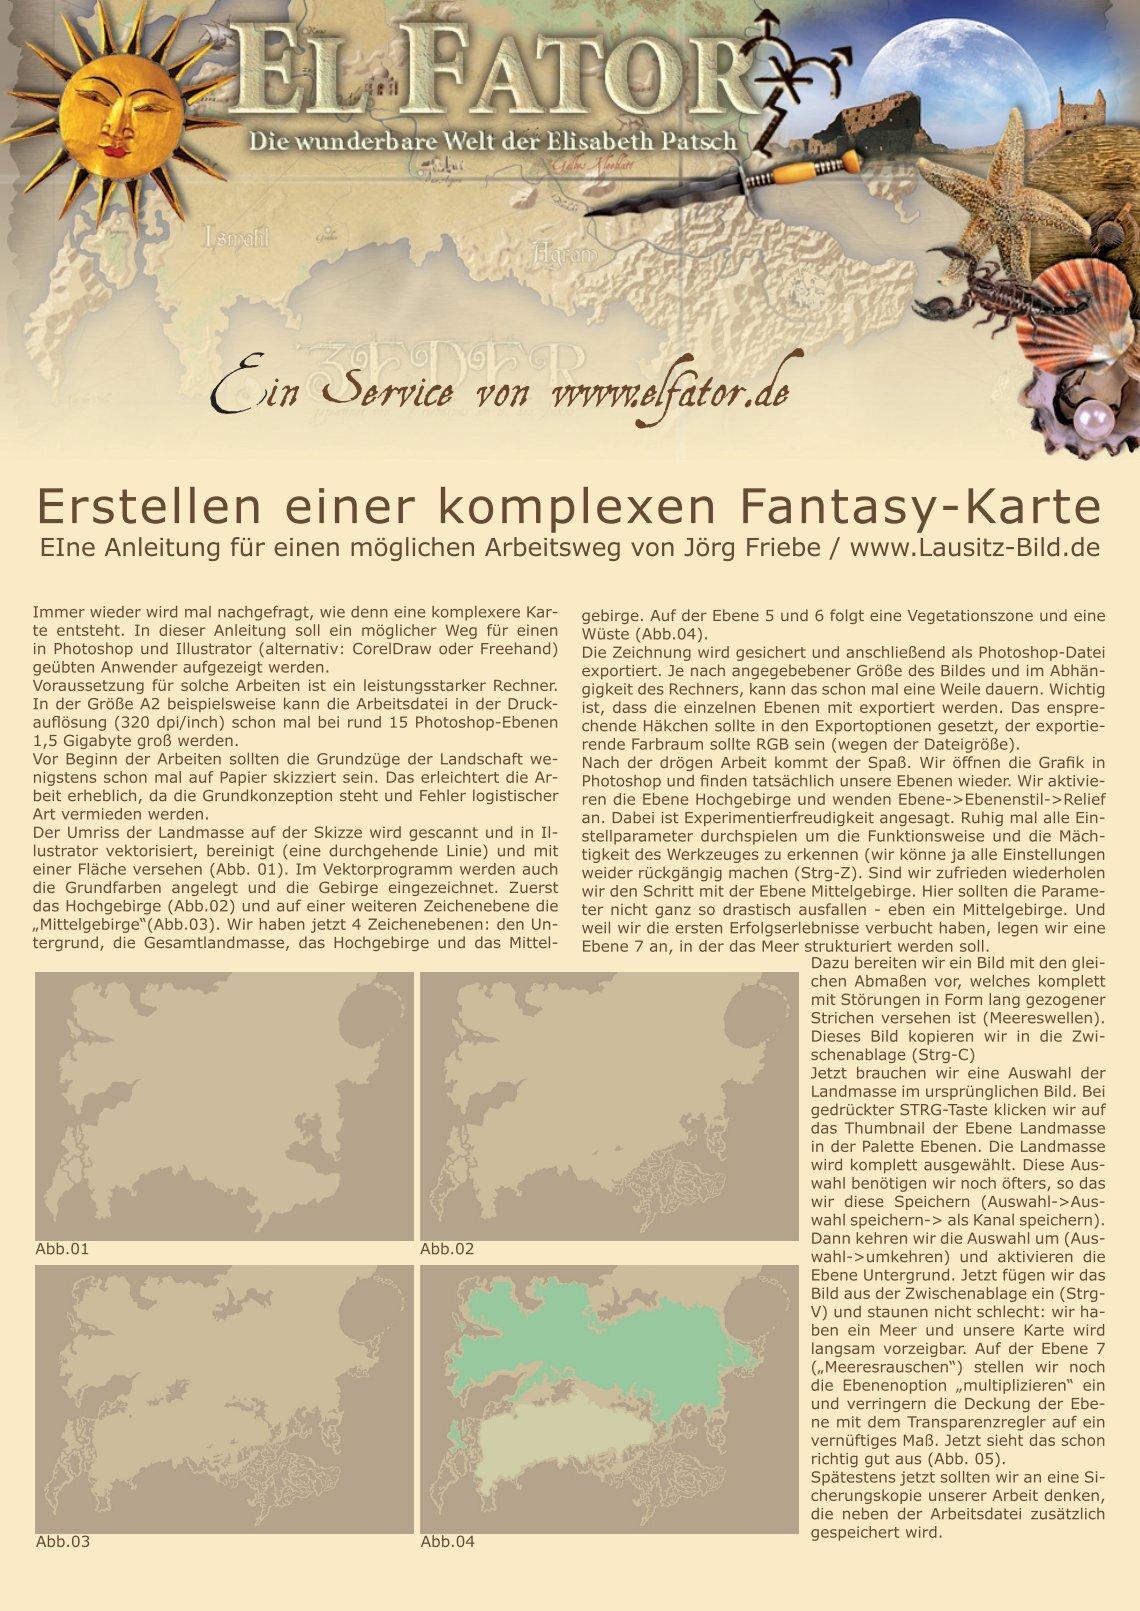 Fantasy Karte.1 Free Magazines From Elfator De